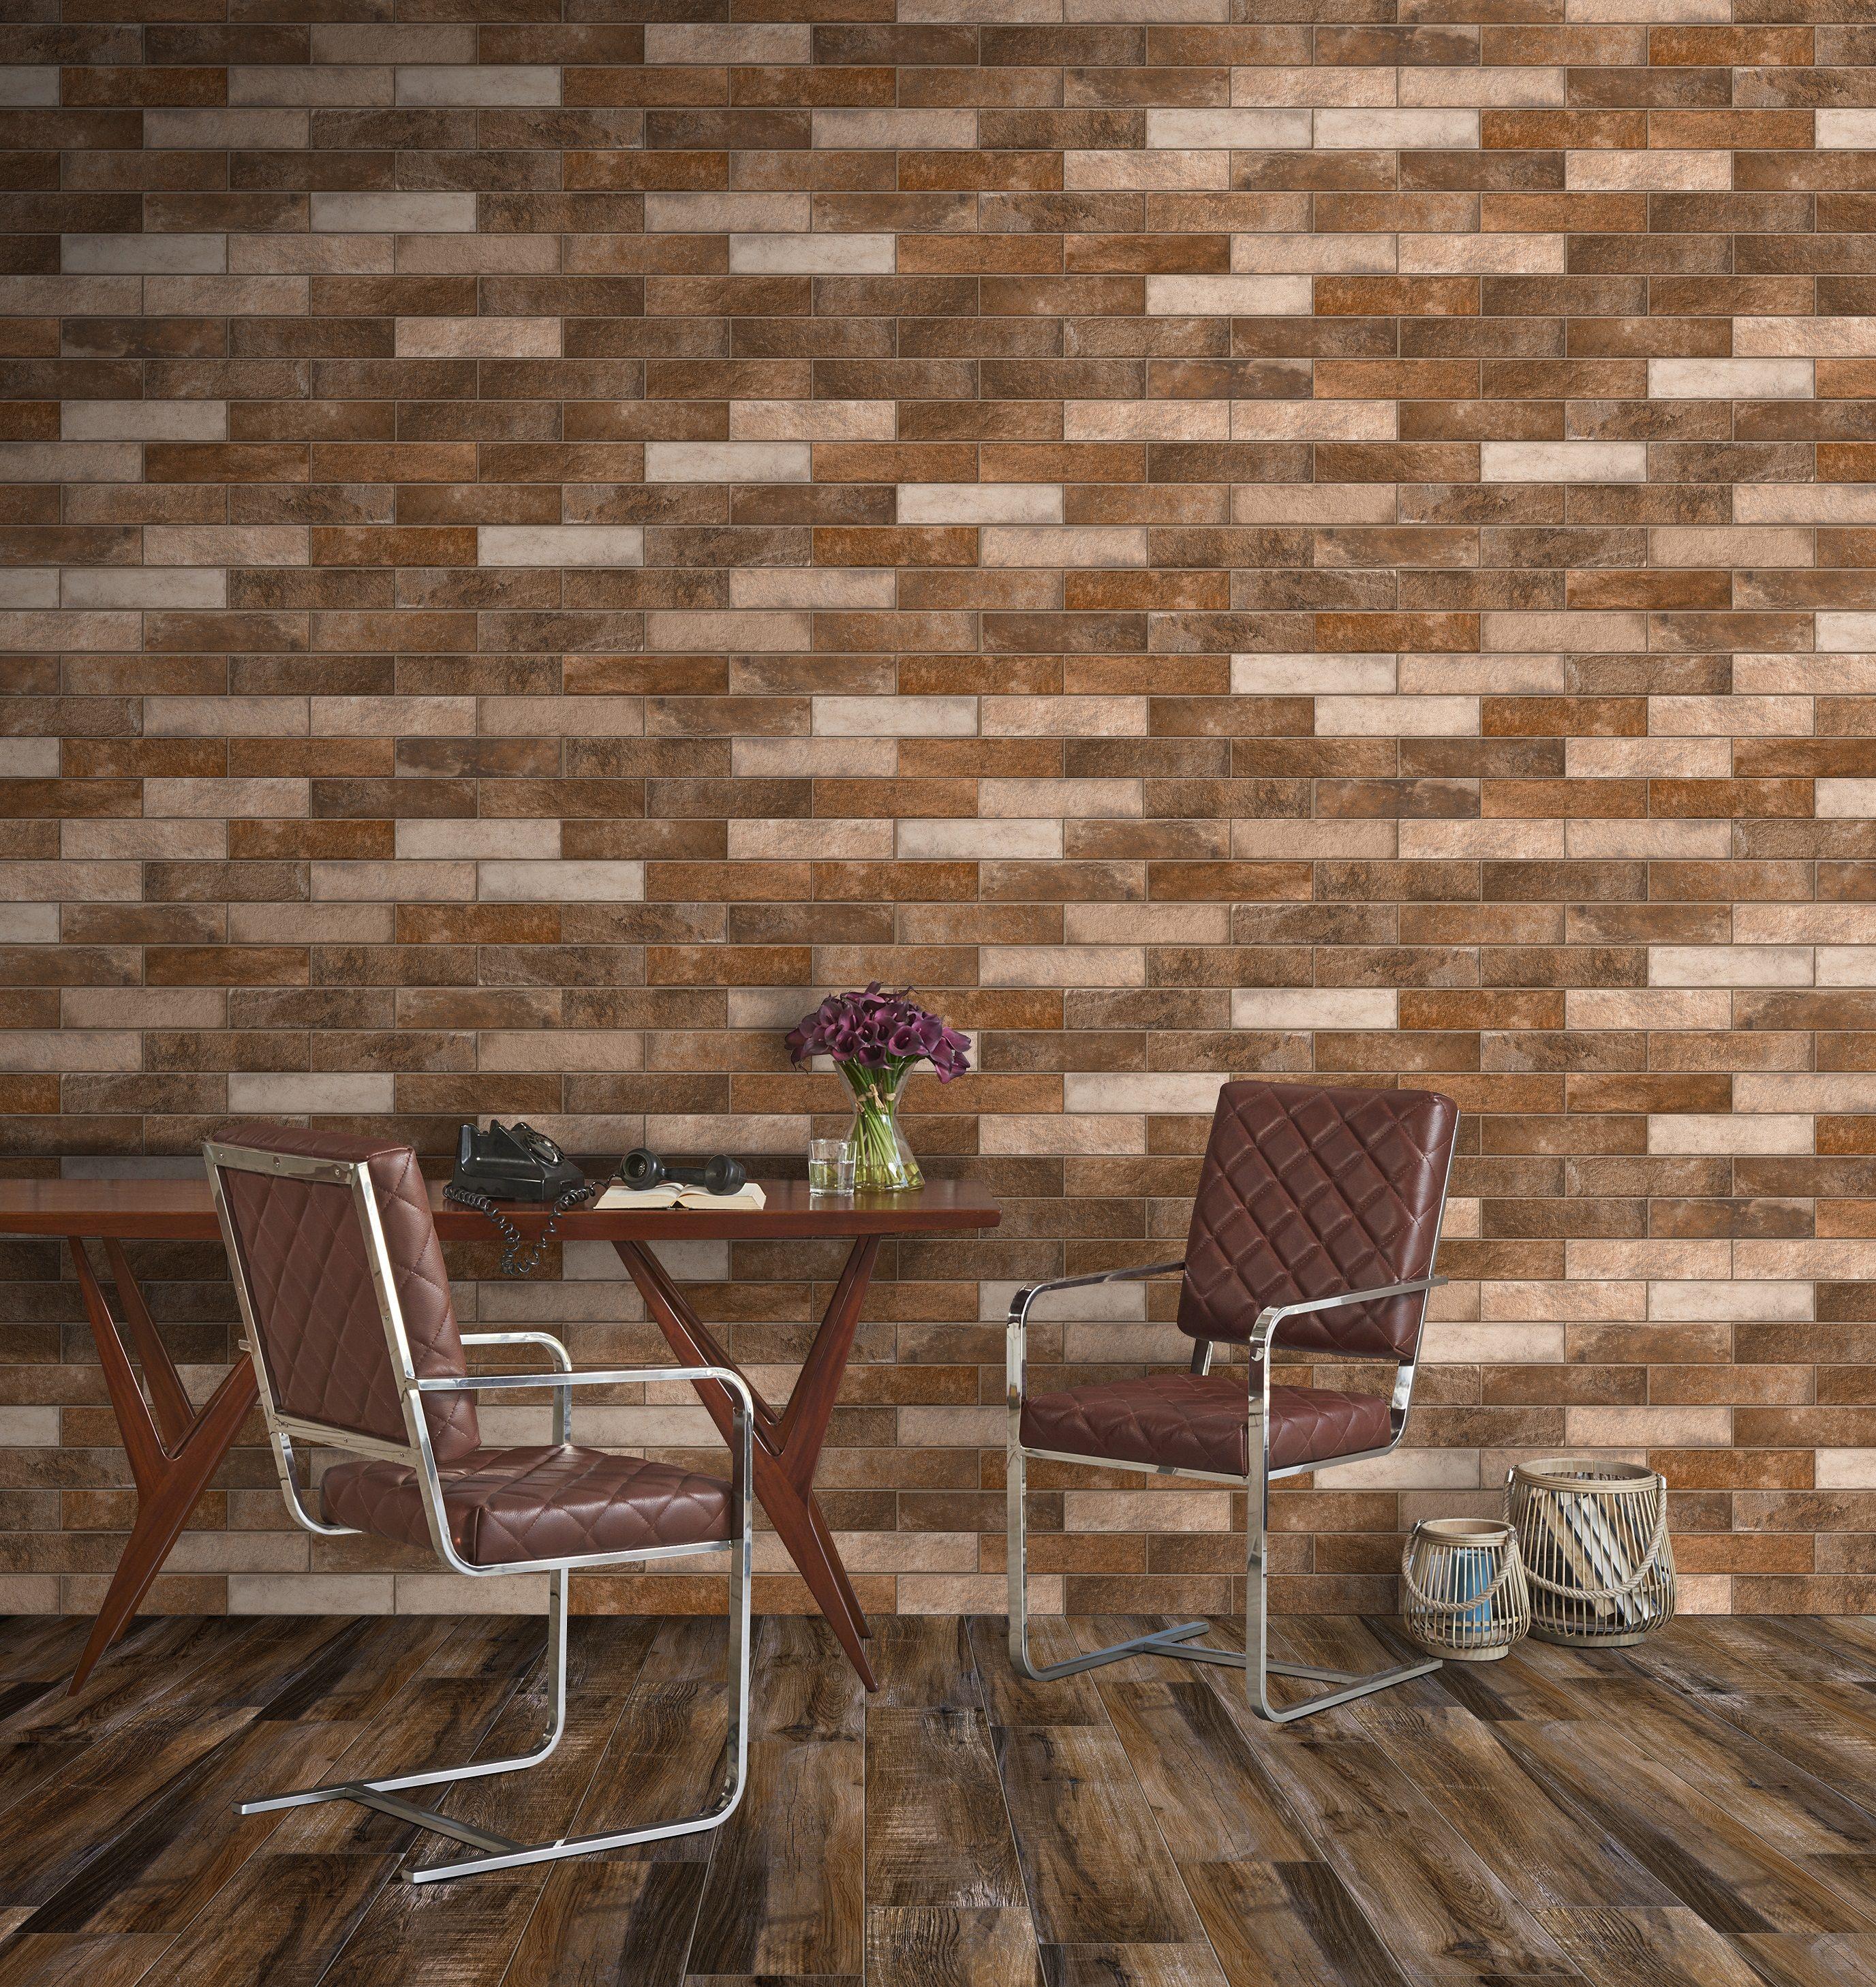 Brick Look Tile | LONDON | Glazed Porcelain, 6x25 cm, Matt ...